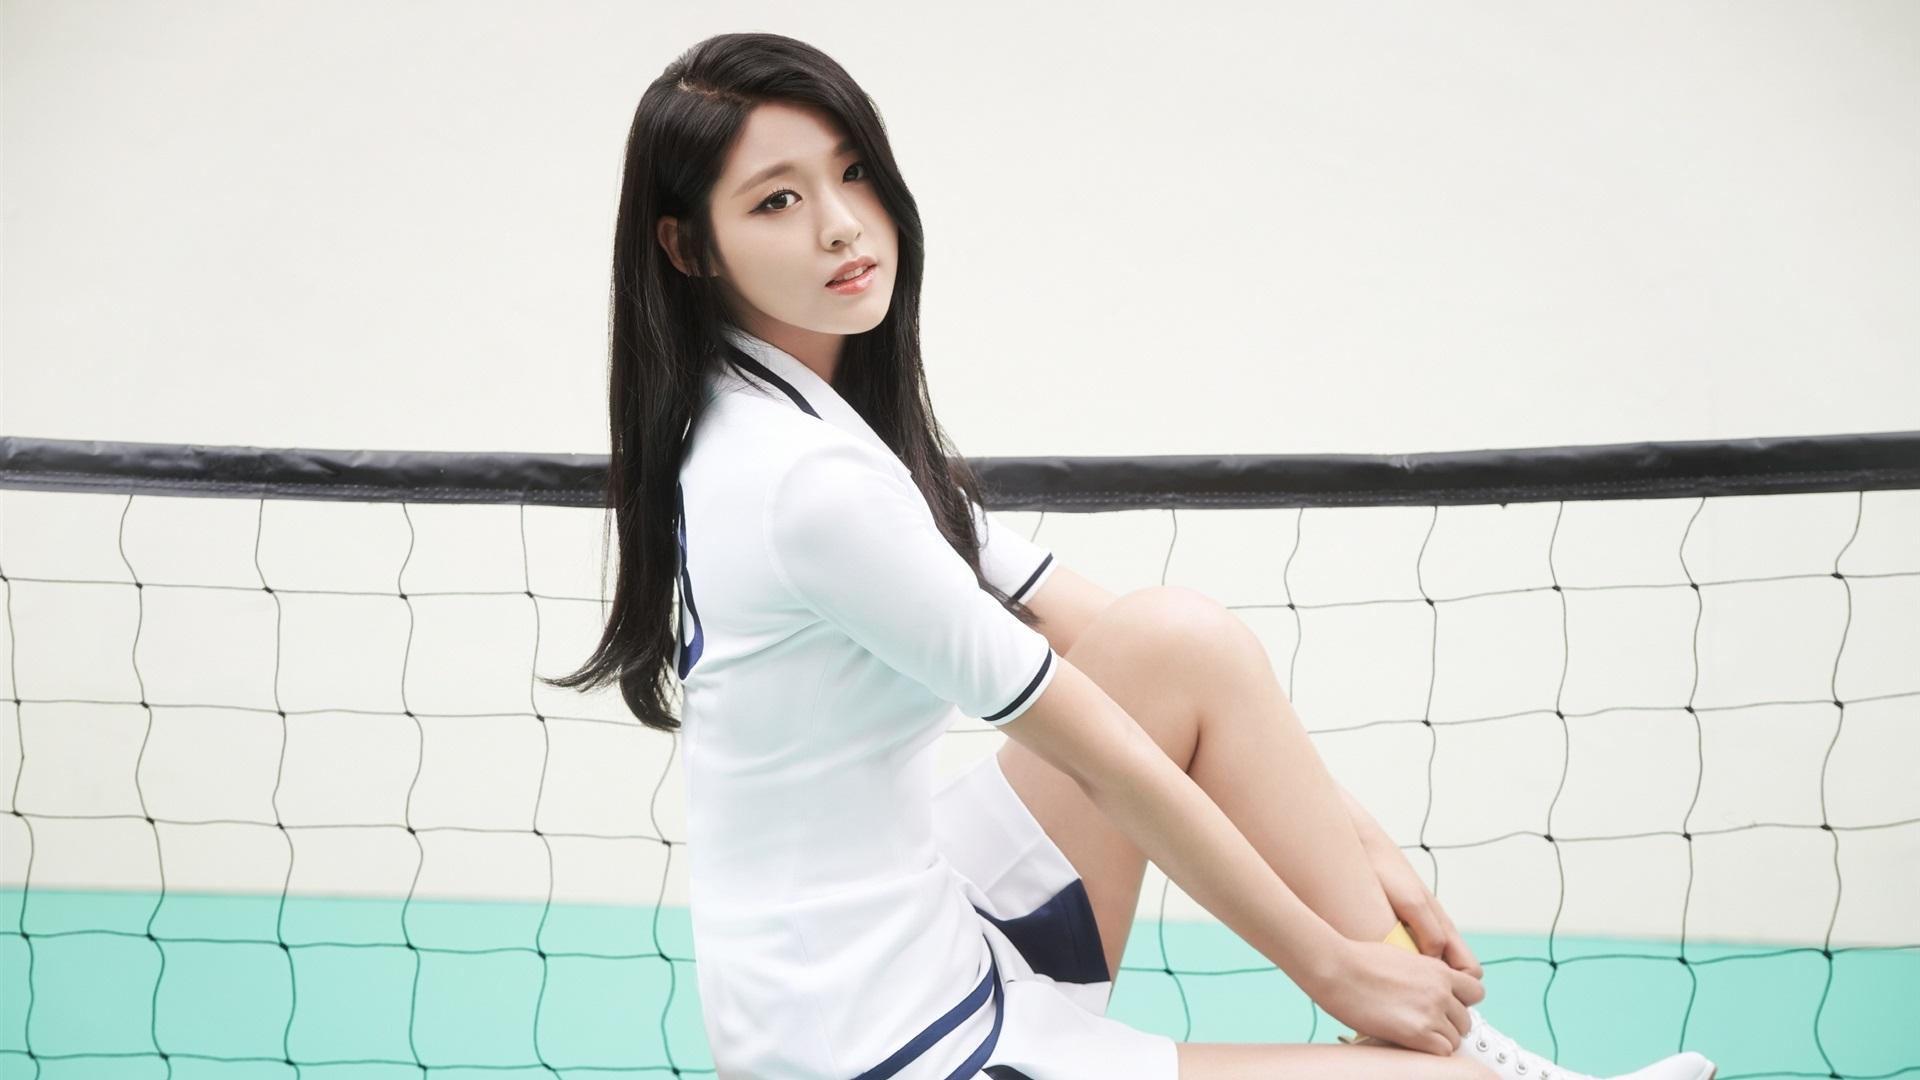 Wallpaper Korean girls, Seolhyun 07 1920x1200 HD Picture, Image